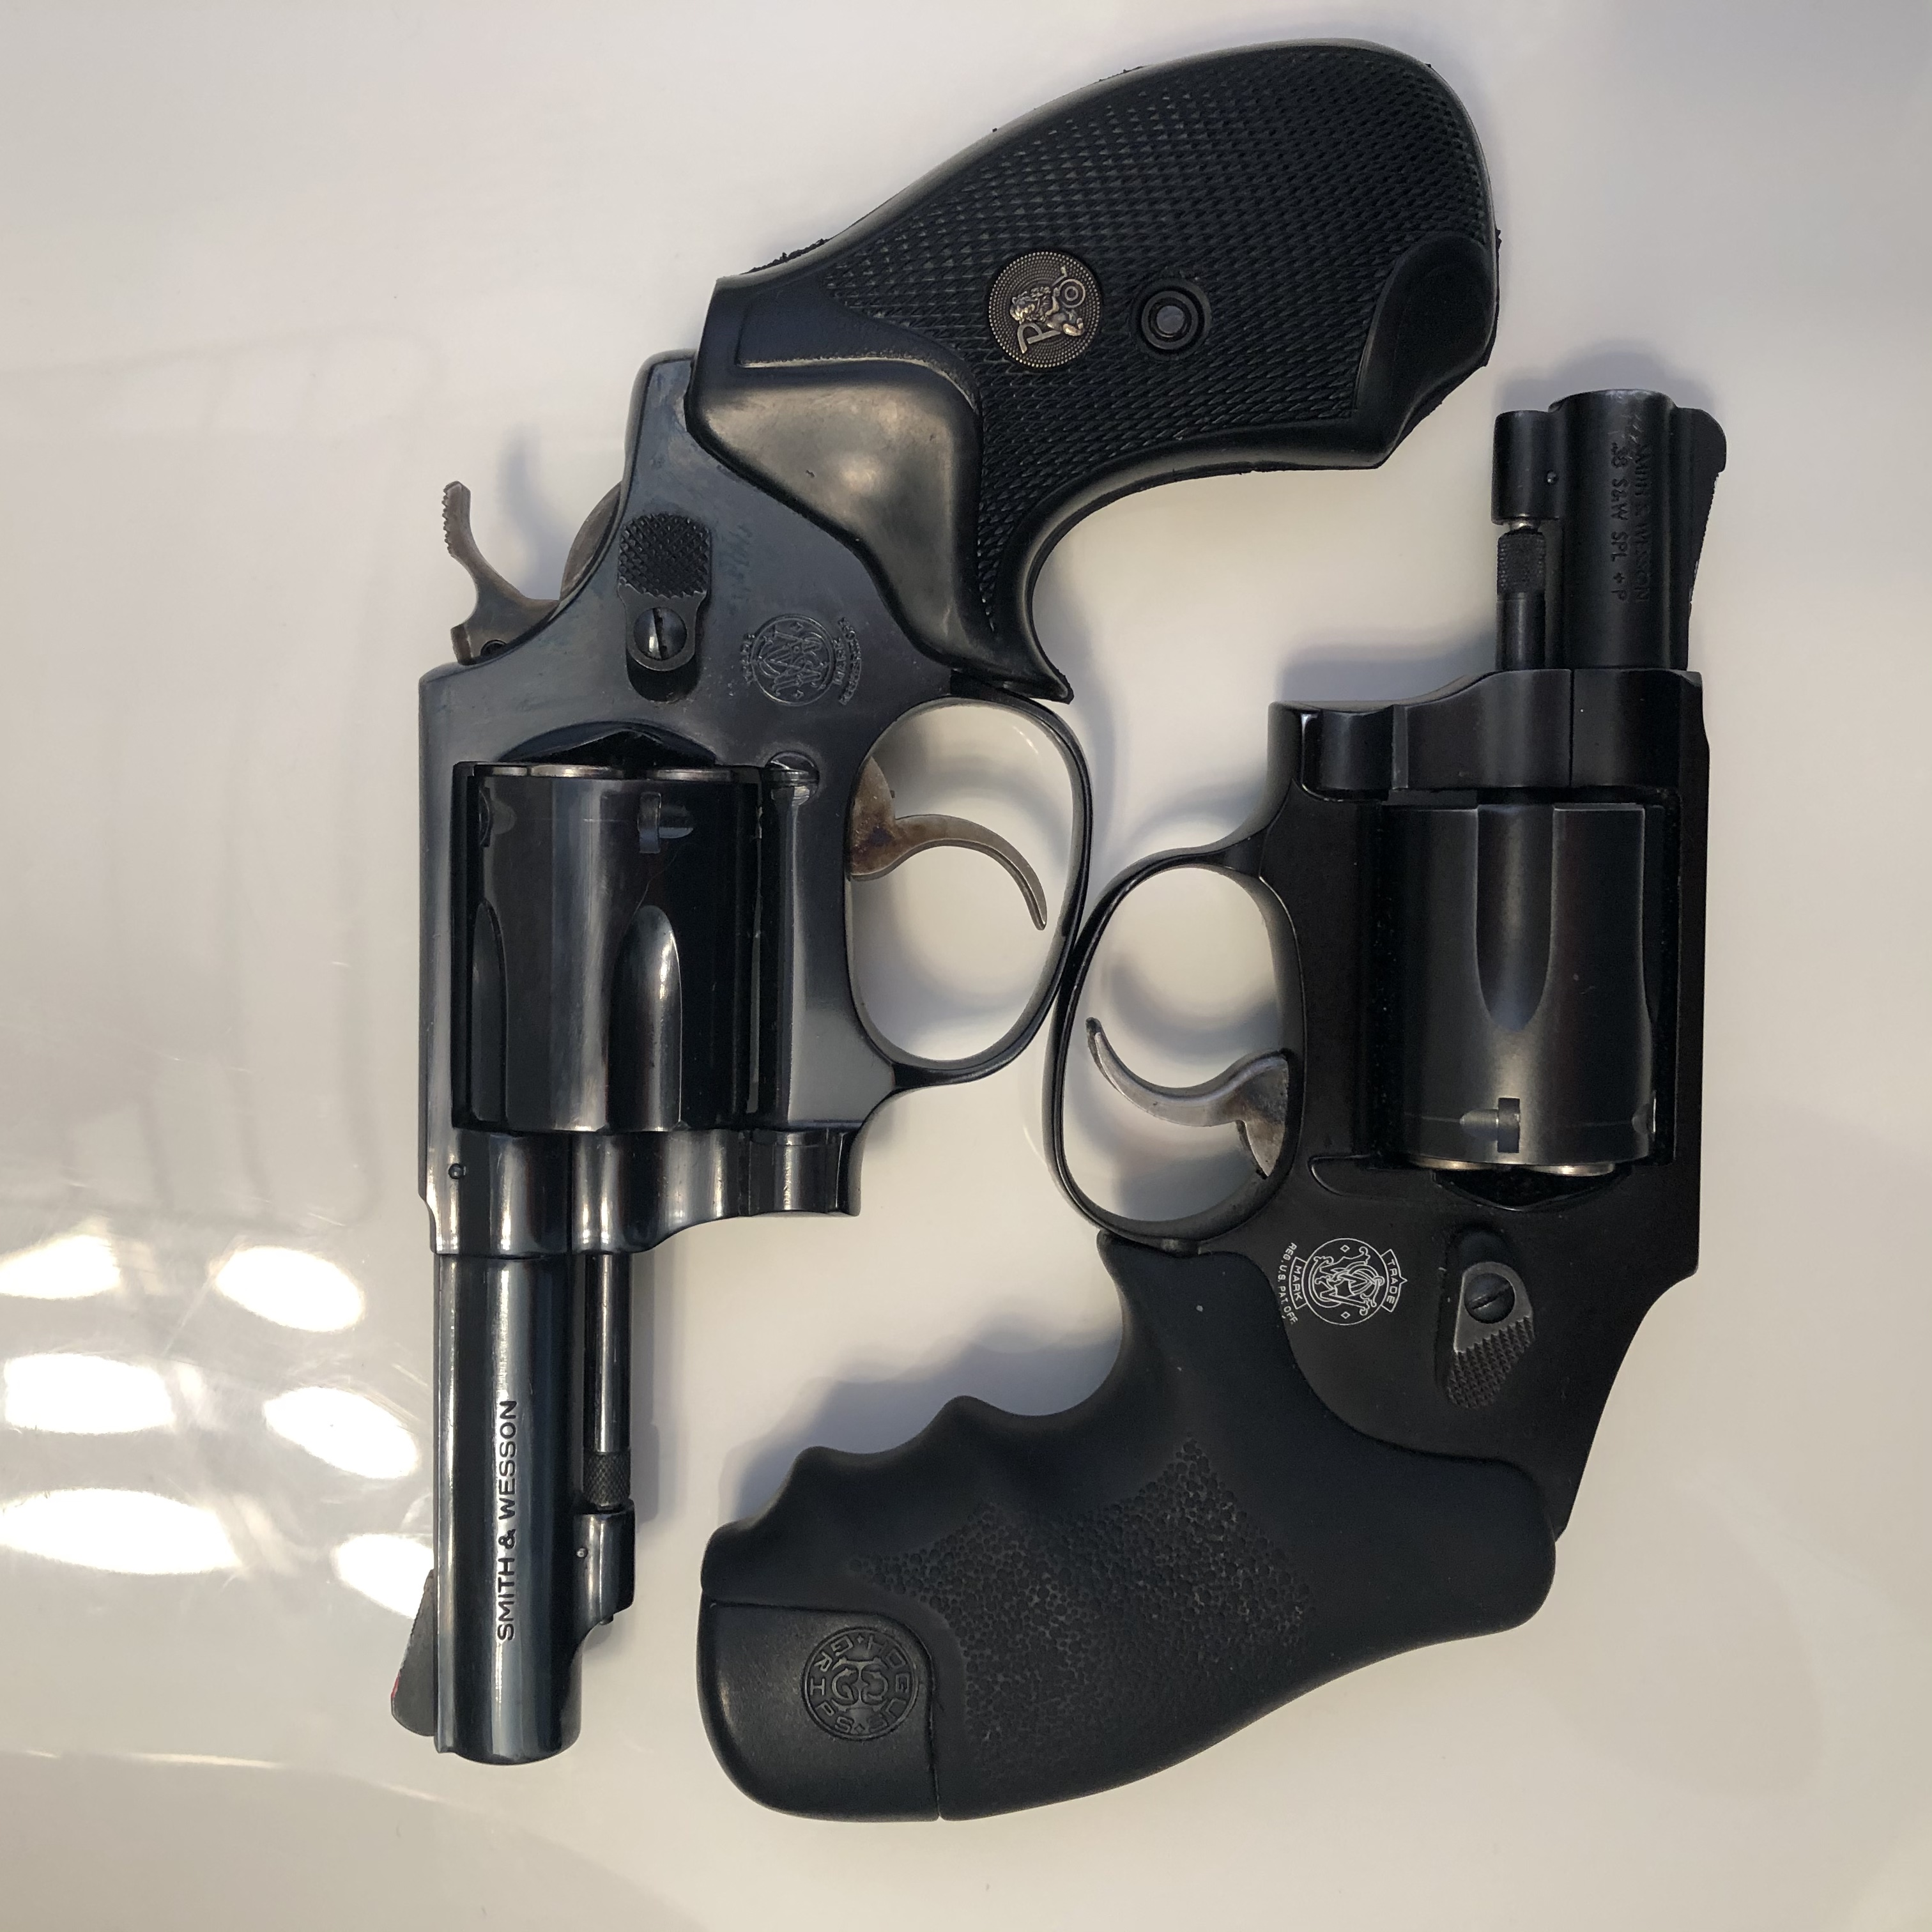 DB9 as a ankle gun-9361f680-bd05-4f3b-89bf-e7493b7d11cb.jpeg